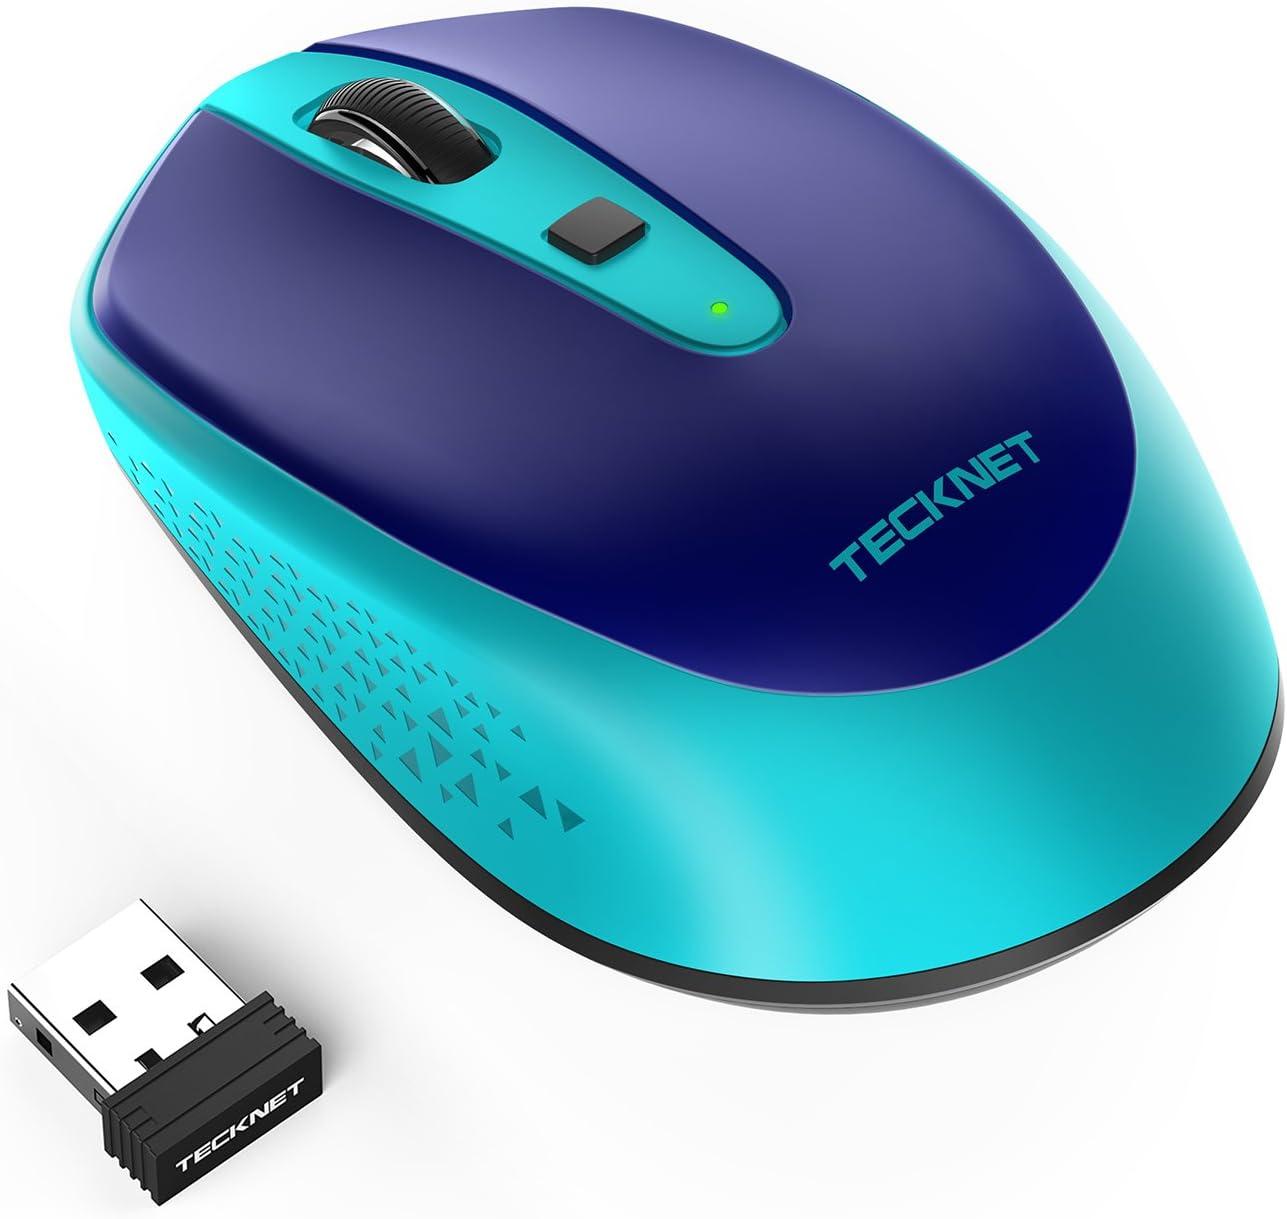 TECKNET Mini Ratón Inalámbrico Wireless Mouse Óptico, Omni 2.4G Ratón Portátil con Receptor USB Nano, 2000 dpi, 4 Botones, 3 dpi Ajustables, para Laptop, PC, Ordenador, Chromebook, Notebook, Azul